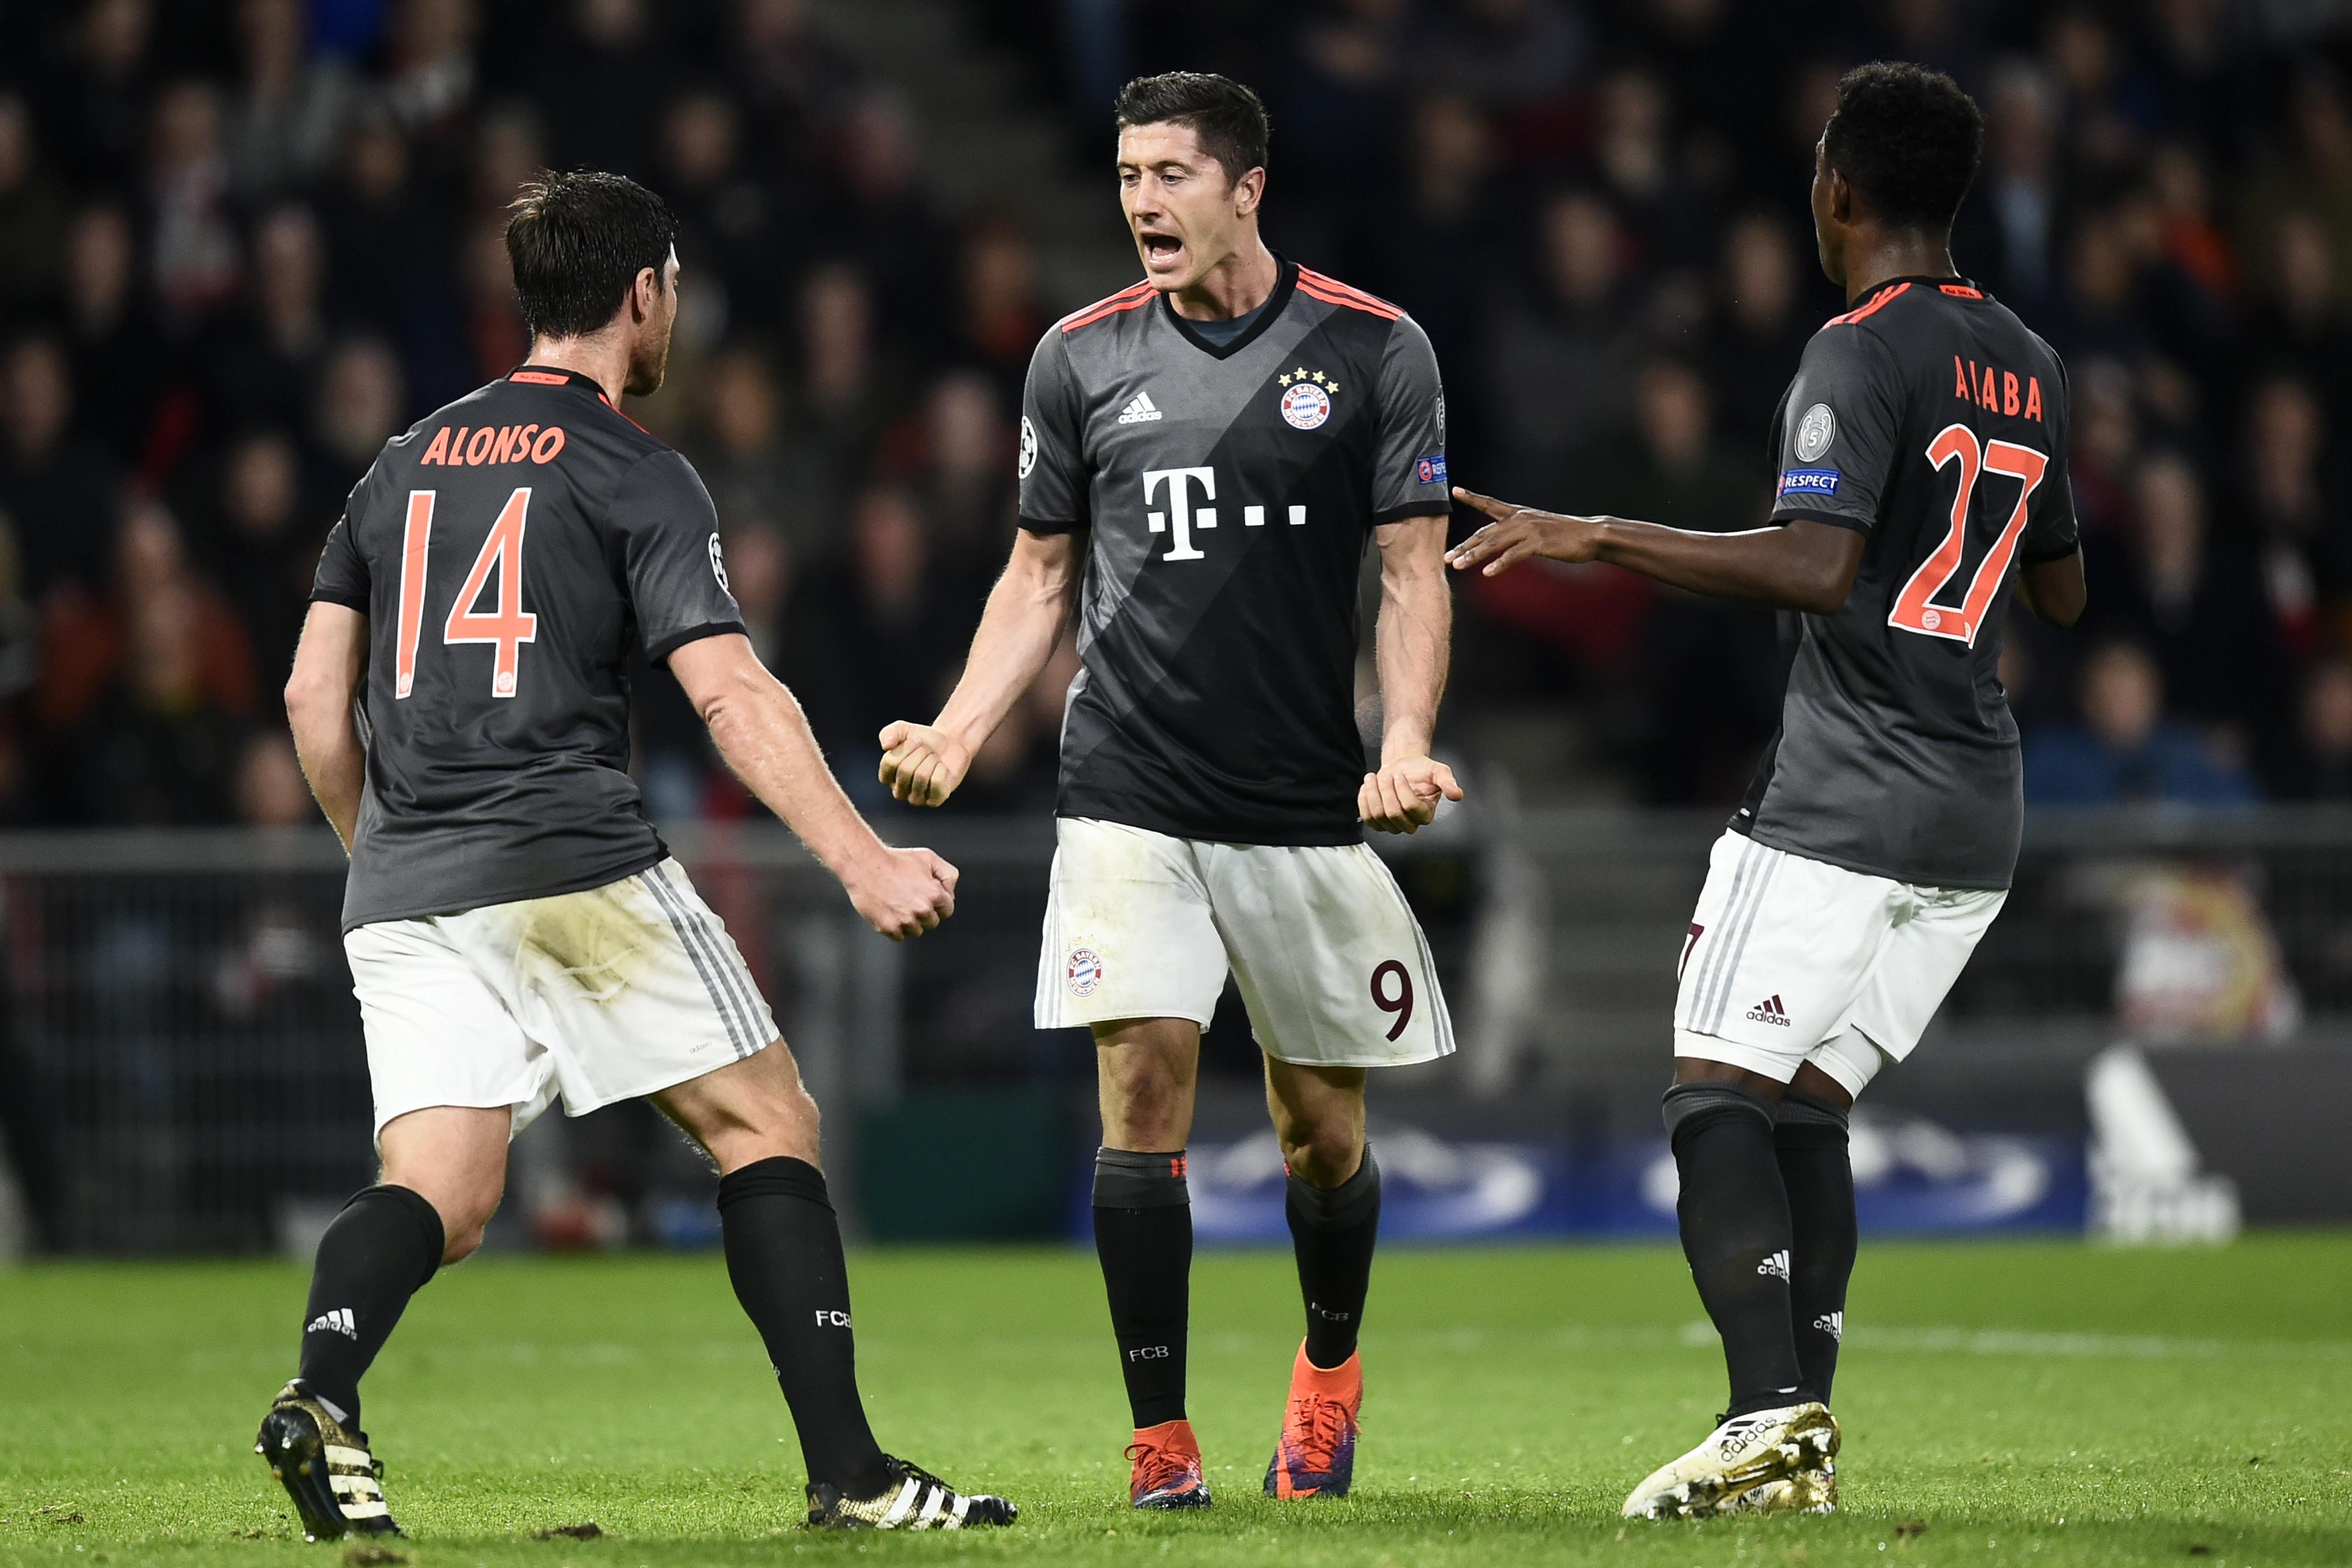 «Боруссия» Дортмунд обыграла «Спортинг» Лиссабон 1:0